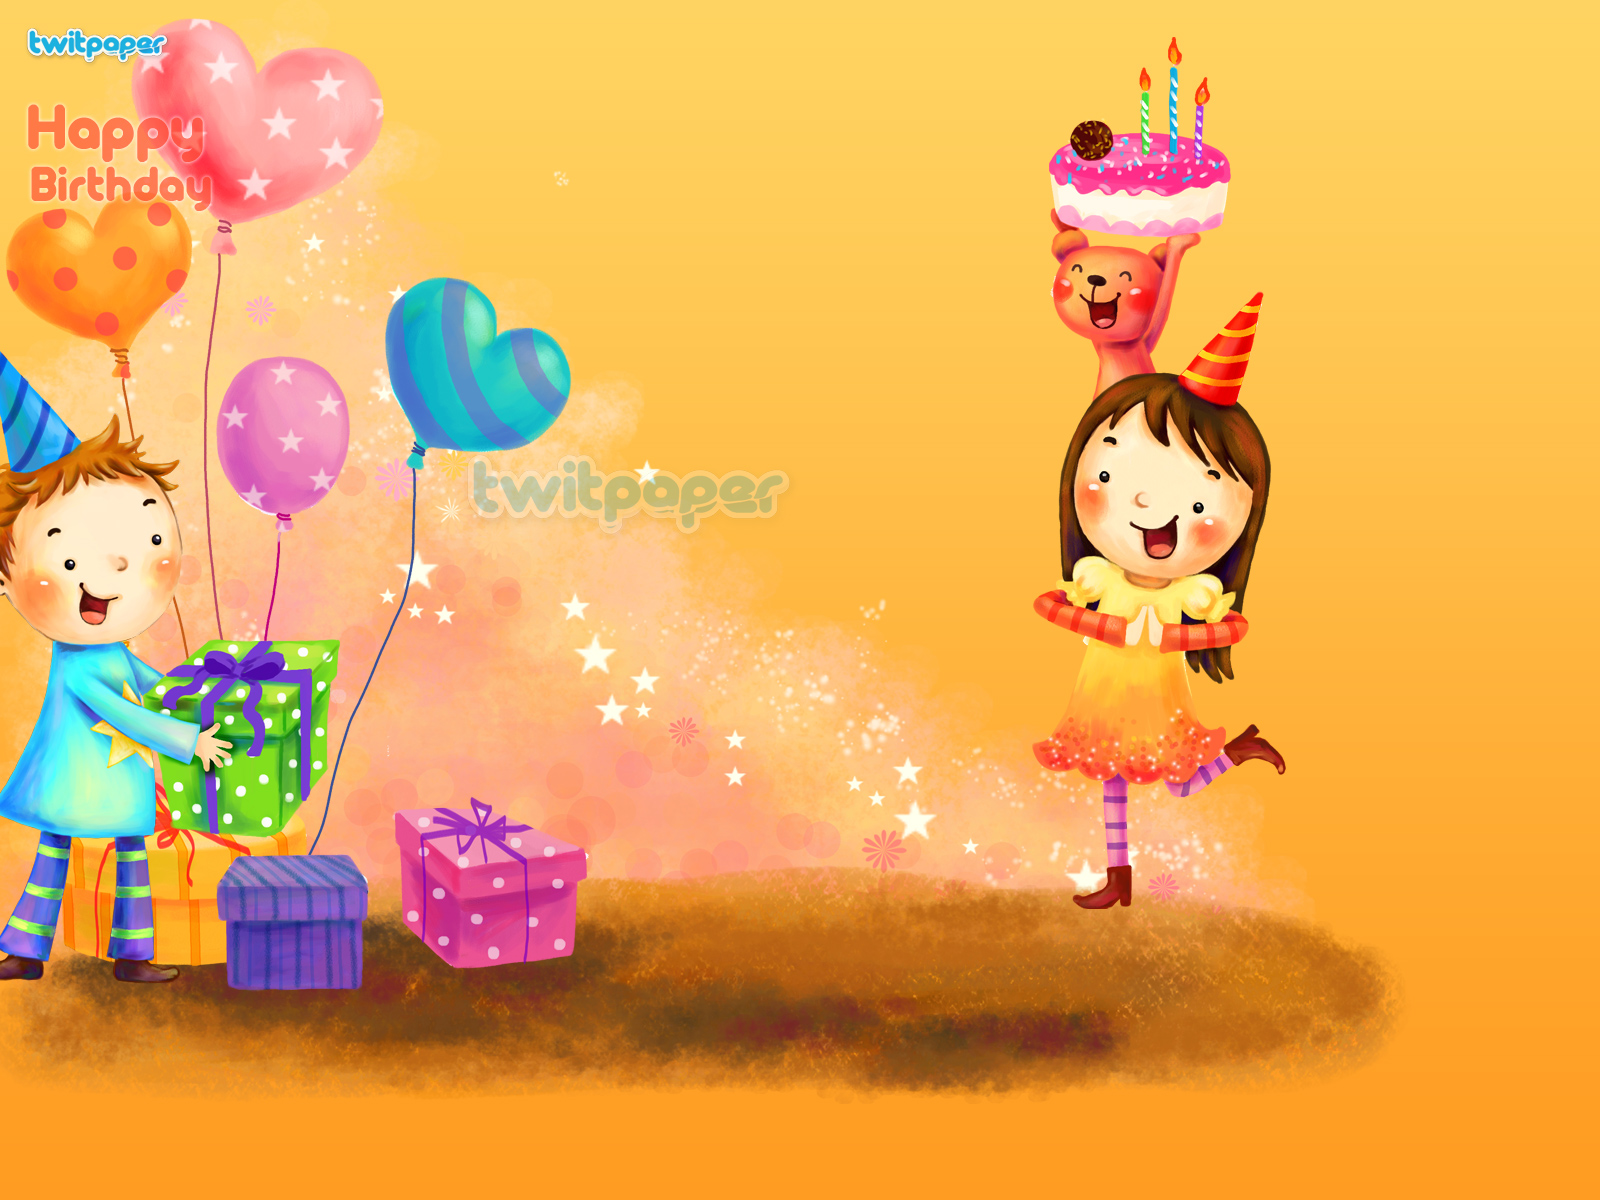 http://3.bp.blogspot.com/-b9ay7ybStoo/UUXr0bIcq2I/AAAAAAABMkg/BQAfnYzGWtc/s1600/hinh+nen+sinh+nhat,+happy+birthday+wallpaper+(2).jpg